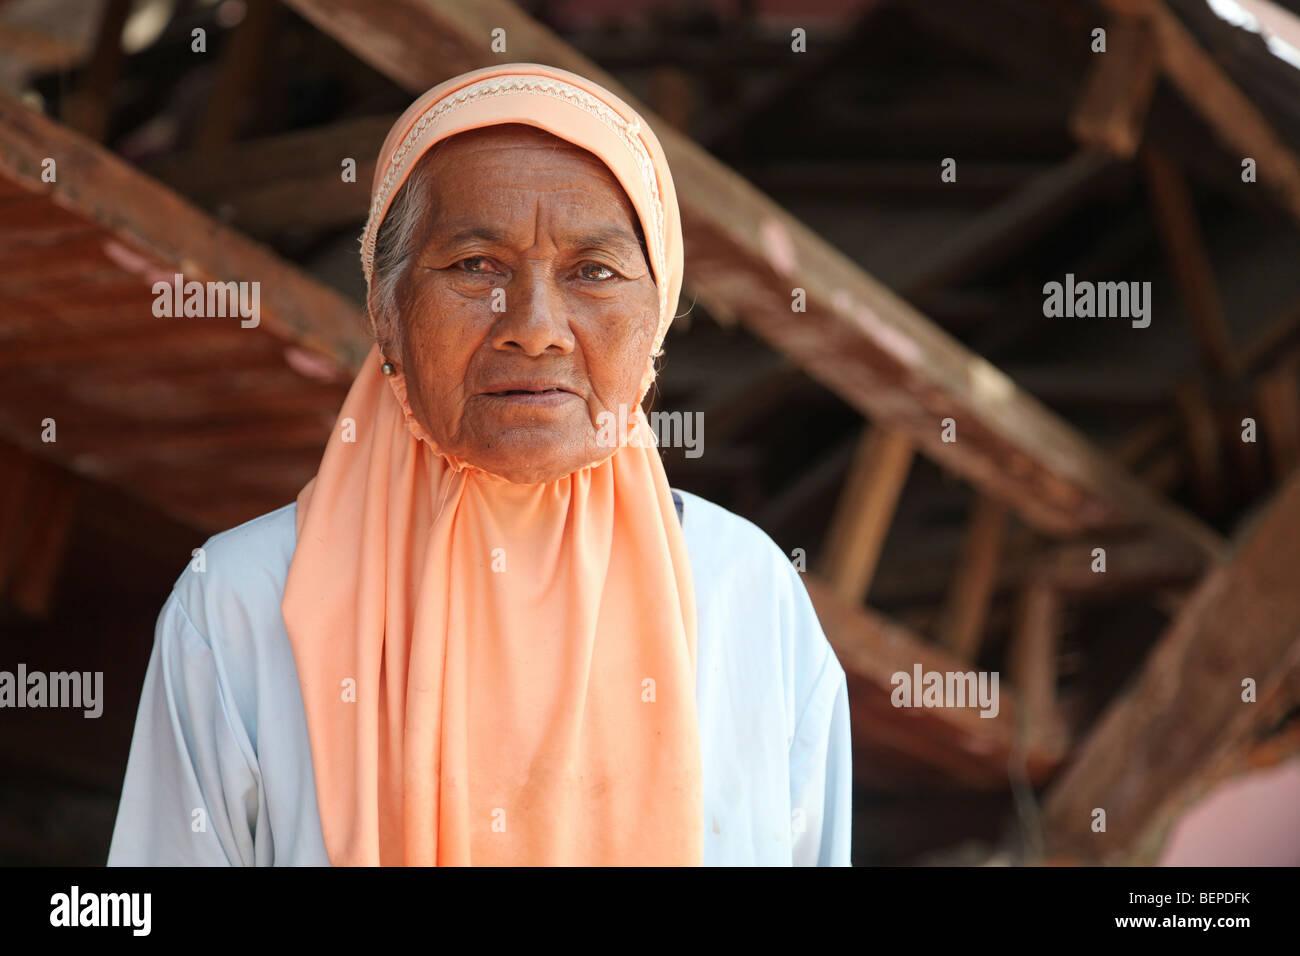 Earthquake survivor, Jawi Duku, Sungai Limau, Kab. Padang Pariaman, West Sumatra, Indonesia - Stock Image